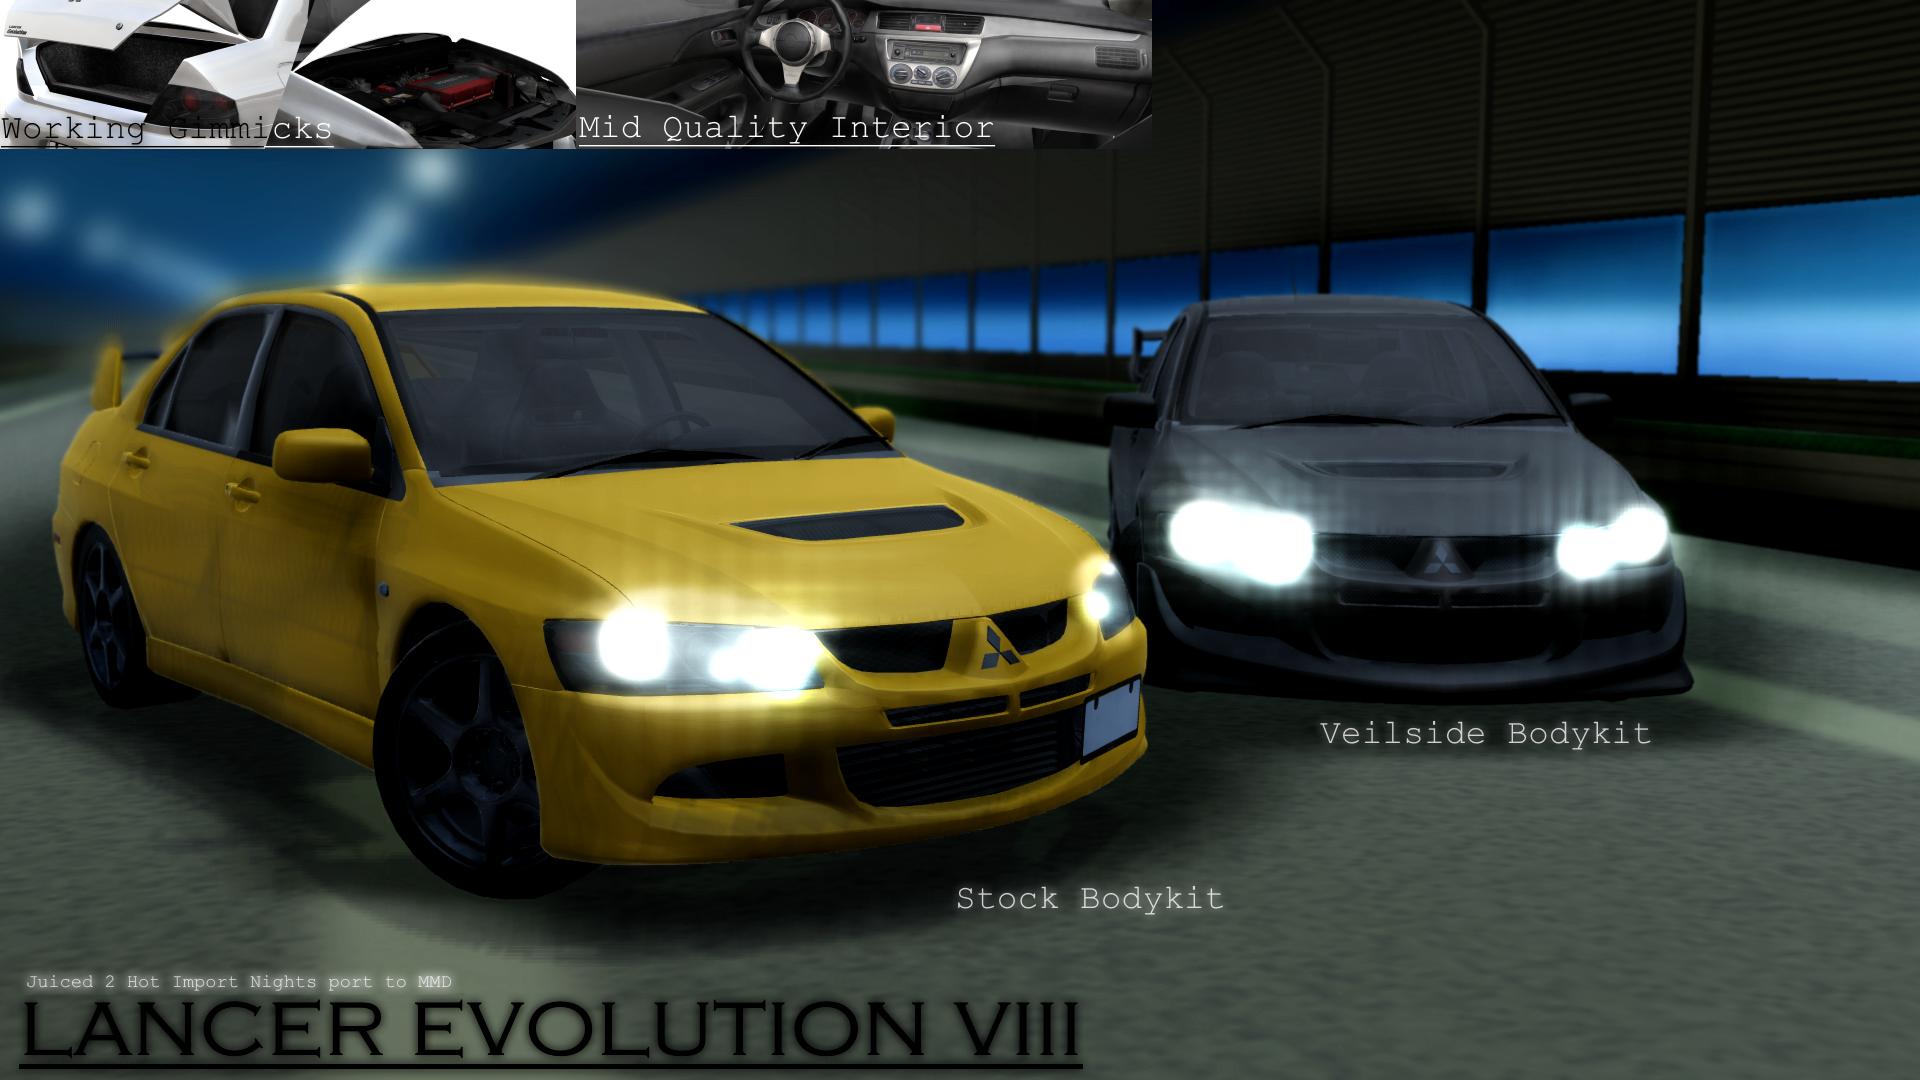 MMD Mitsubishi Motors - Lancer Evolution VIII by MGZweiis